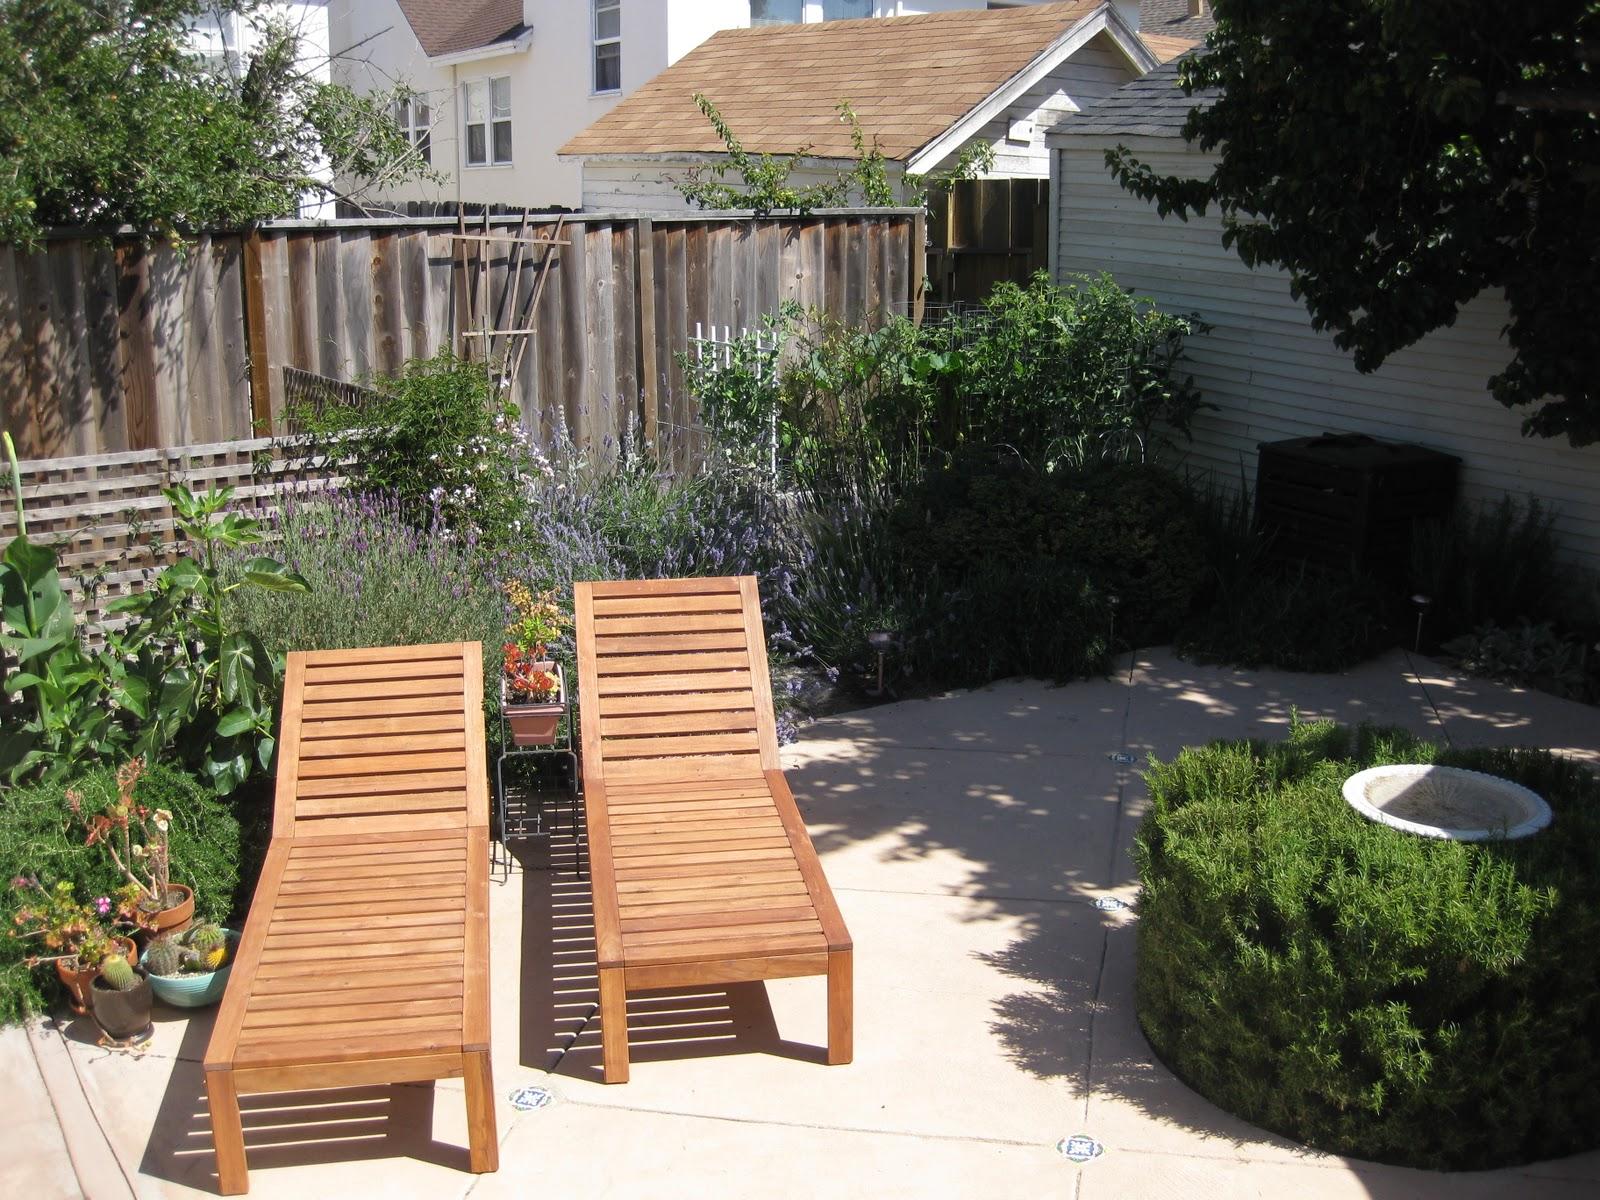 backyard oasis copycatchic. Black Bedroom Furniture Sets. Home Design Ideas